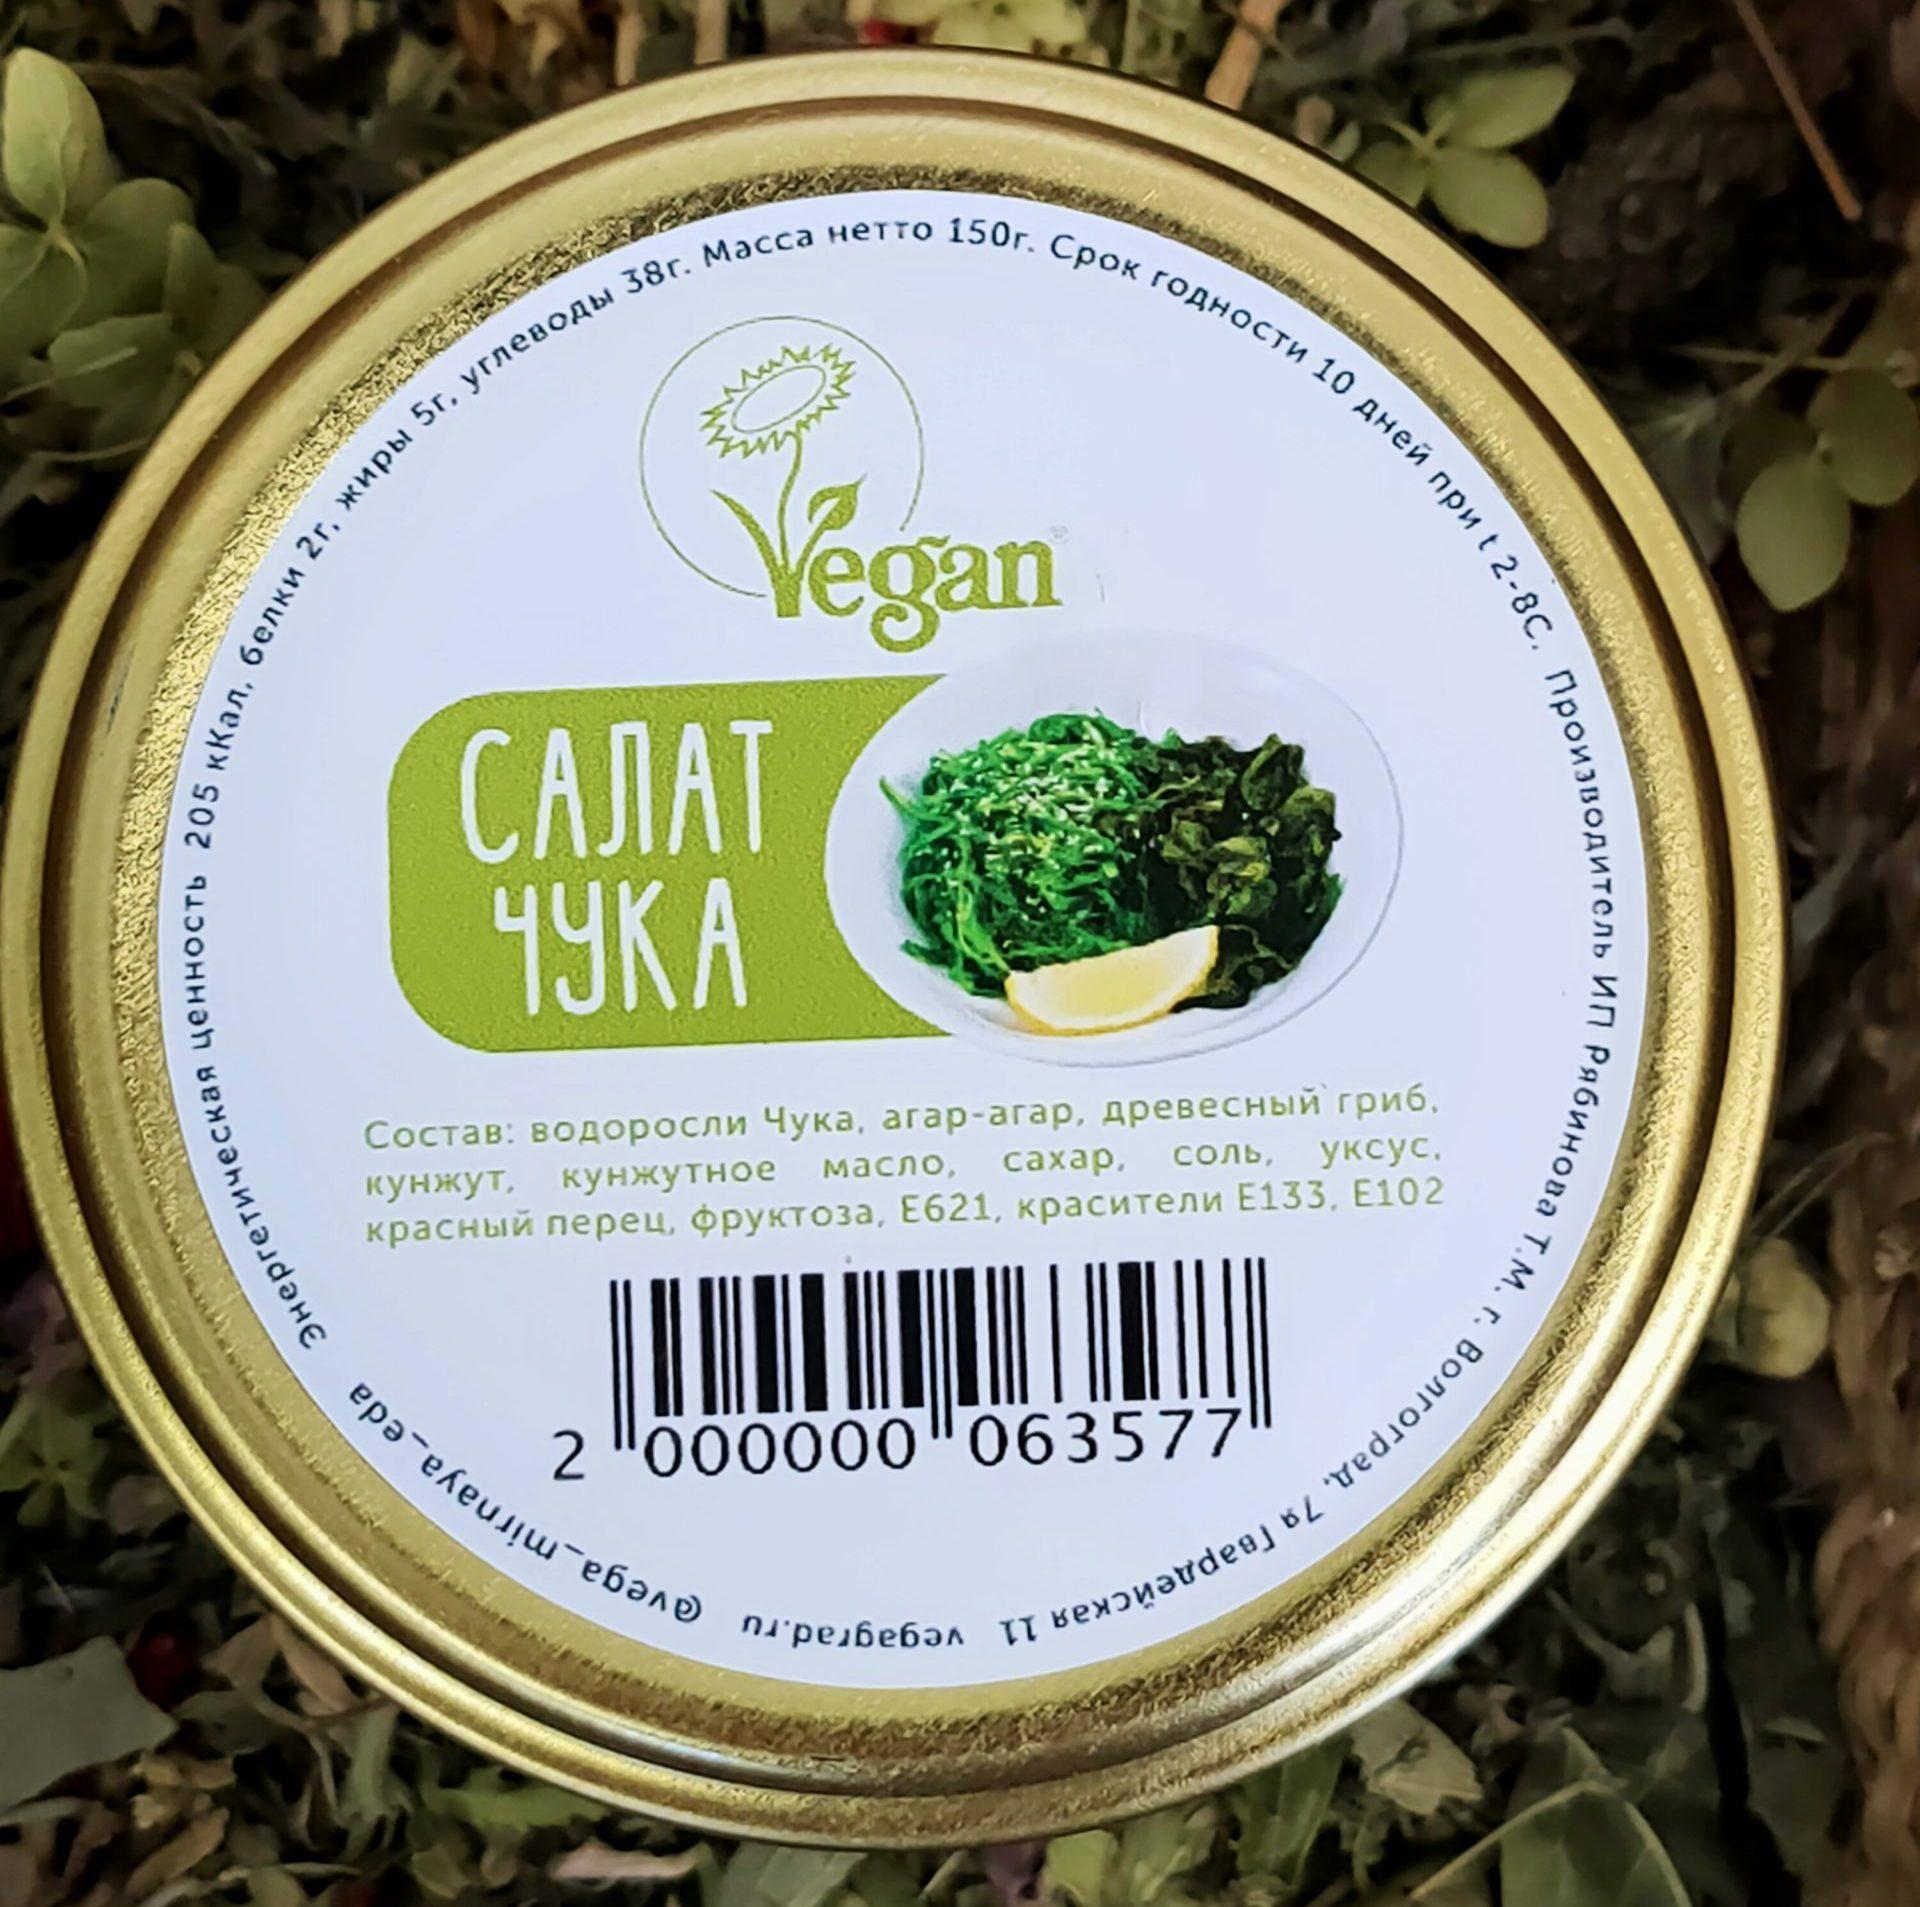 Салат чука Вега мирная еда/150гр.